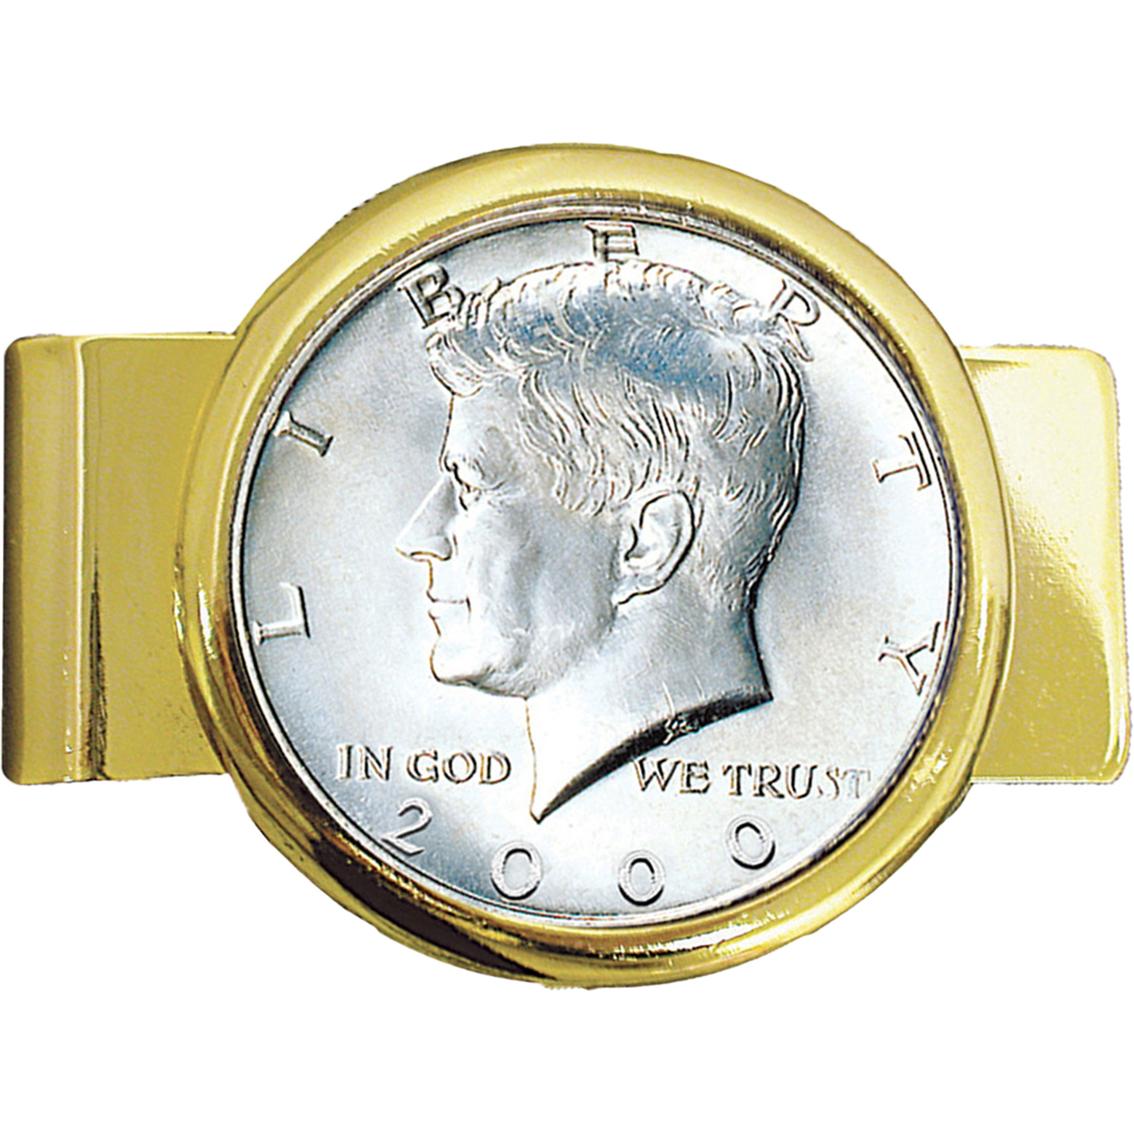 jfk half dollar goldtone money clip cuff links money clips